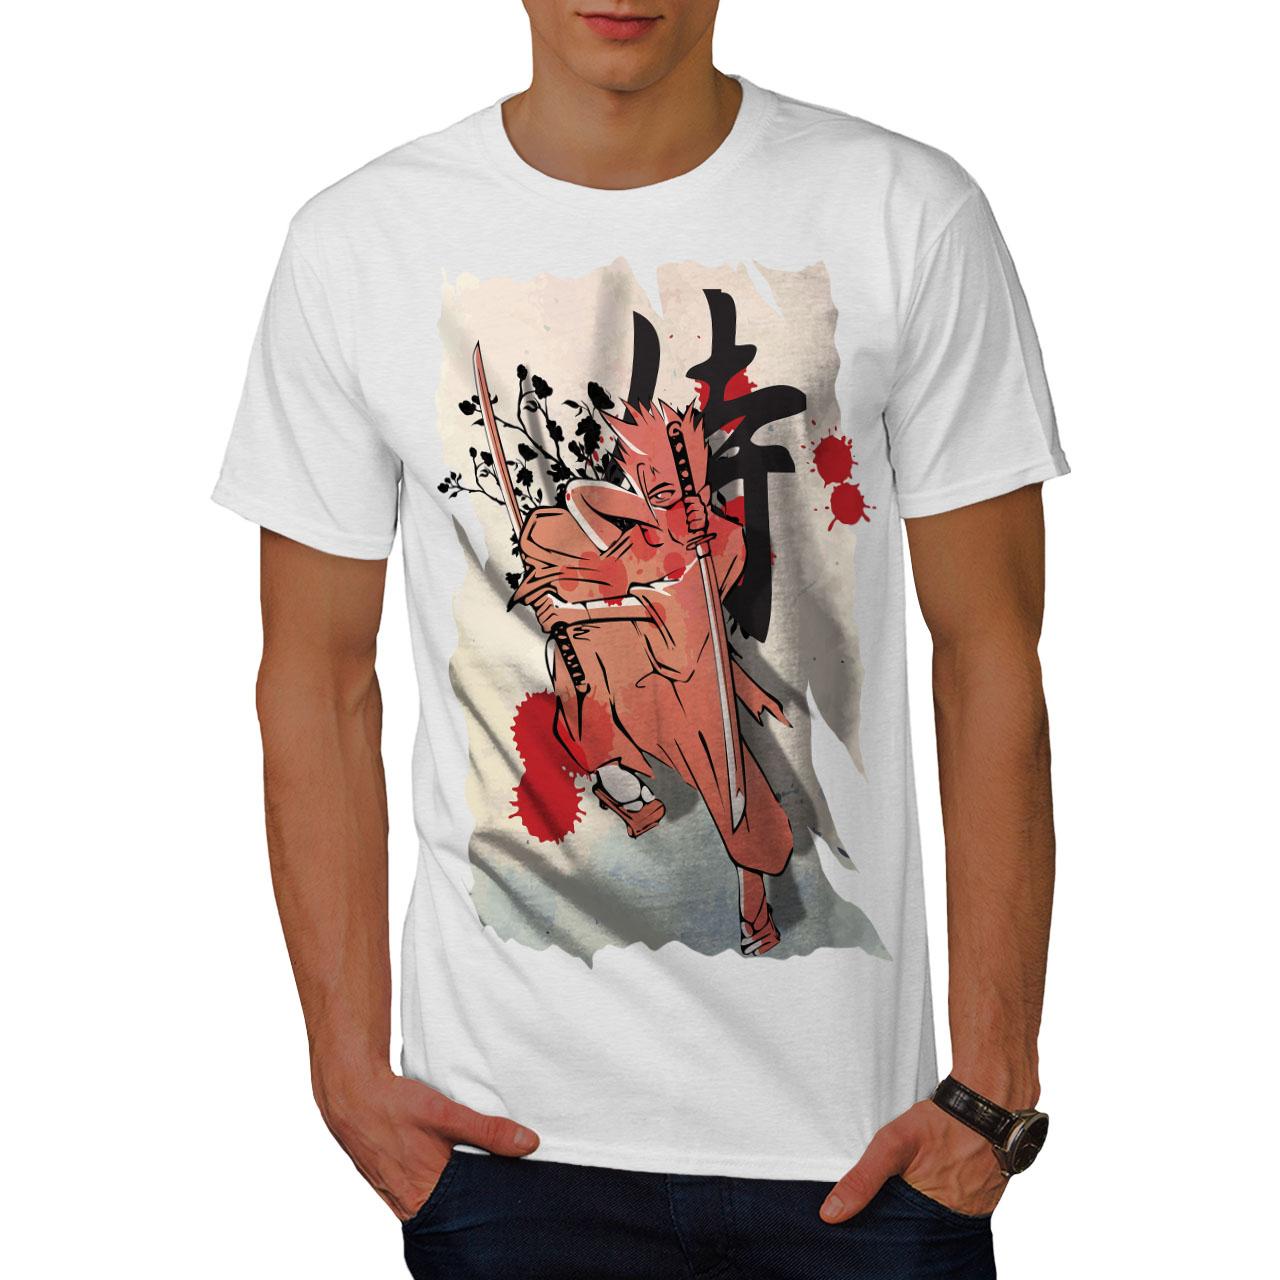 ANIME design grafico stampato T-shirt Wellcoda Fantasy Giappone Samurai Da Uomo T-shirt